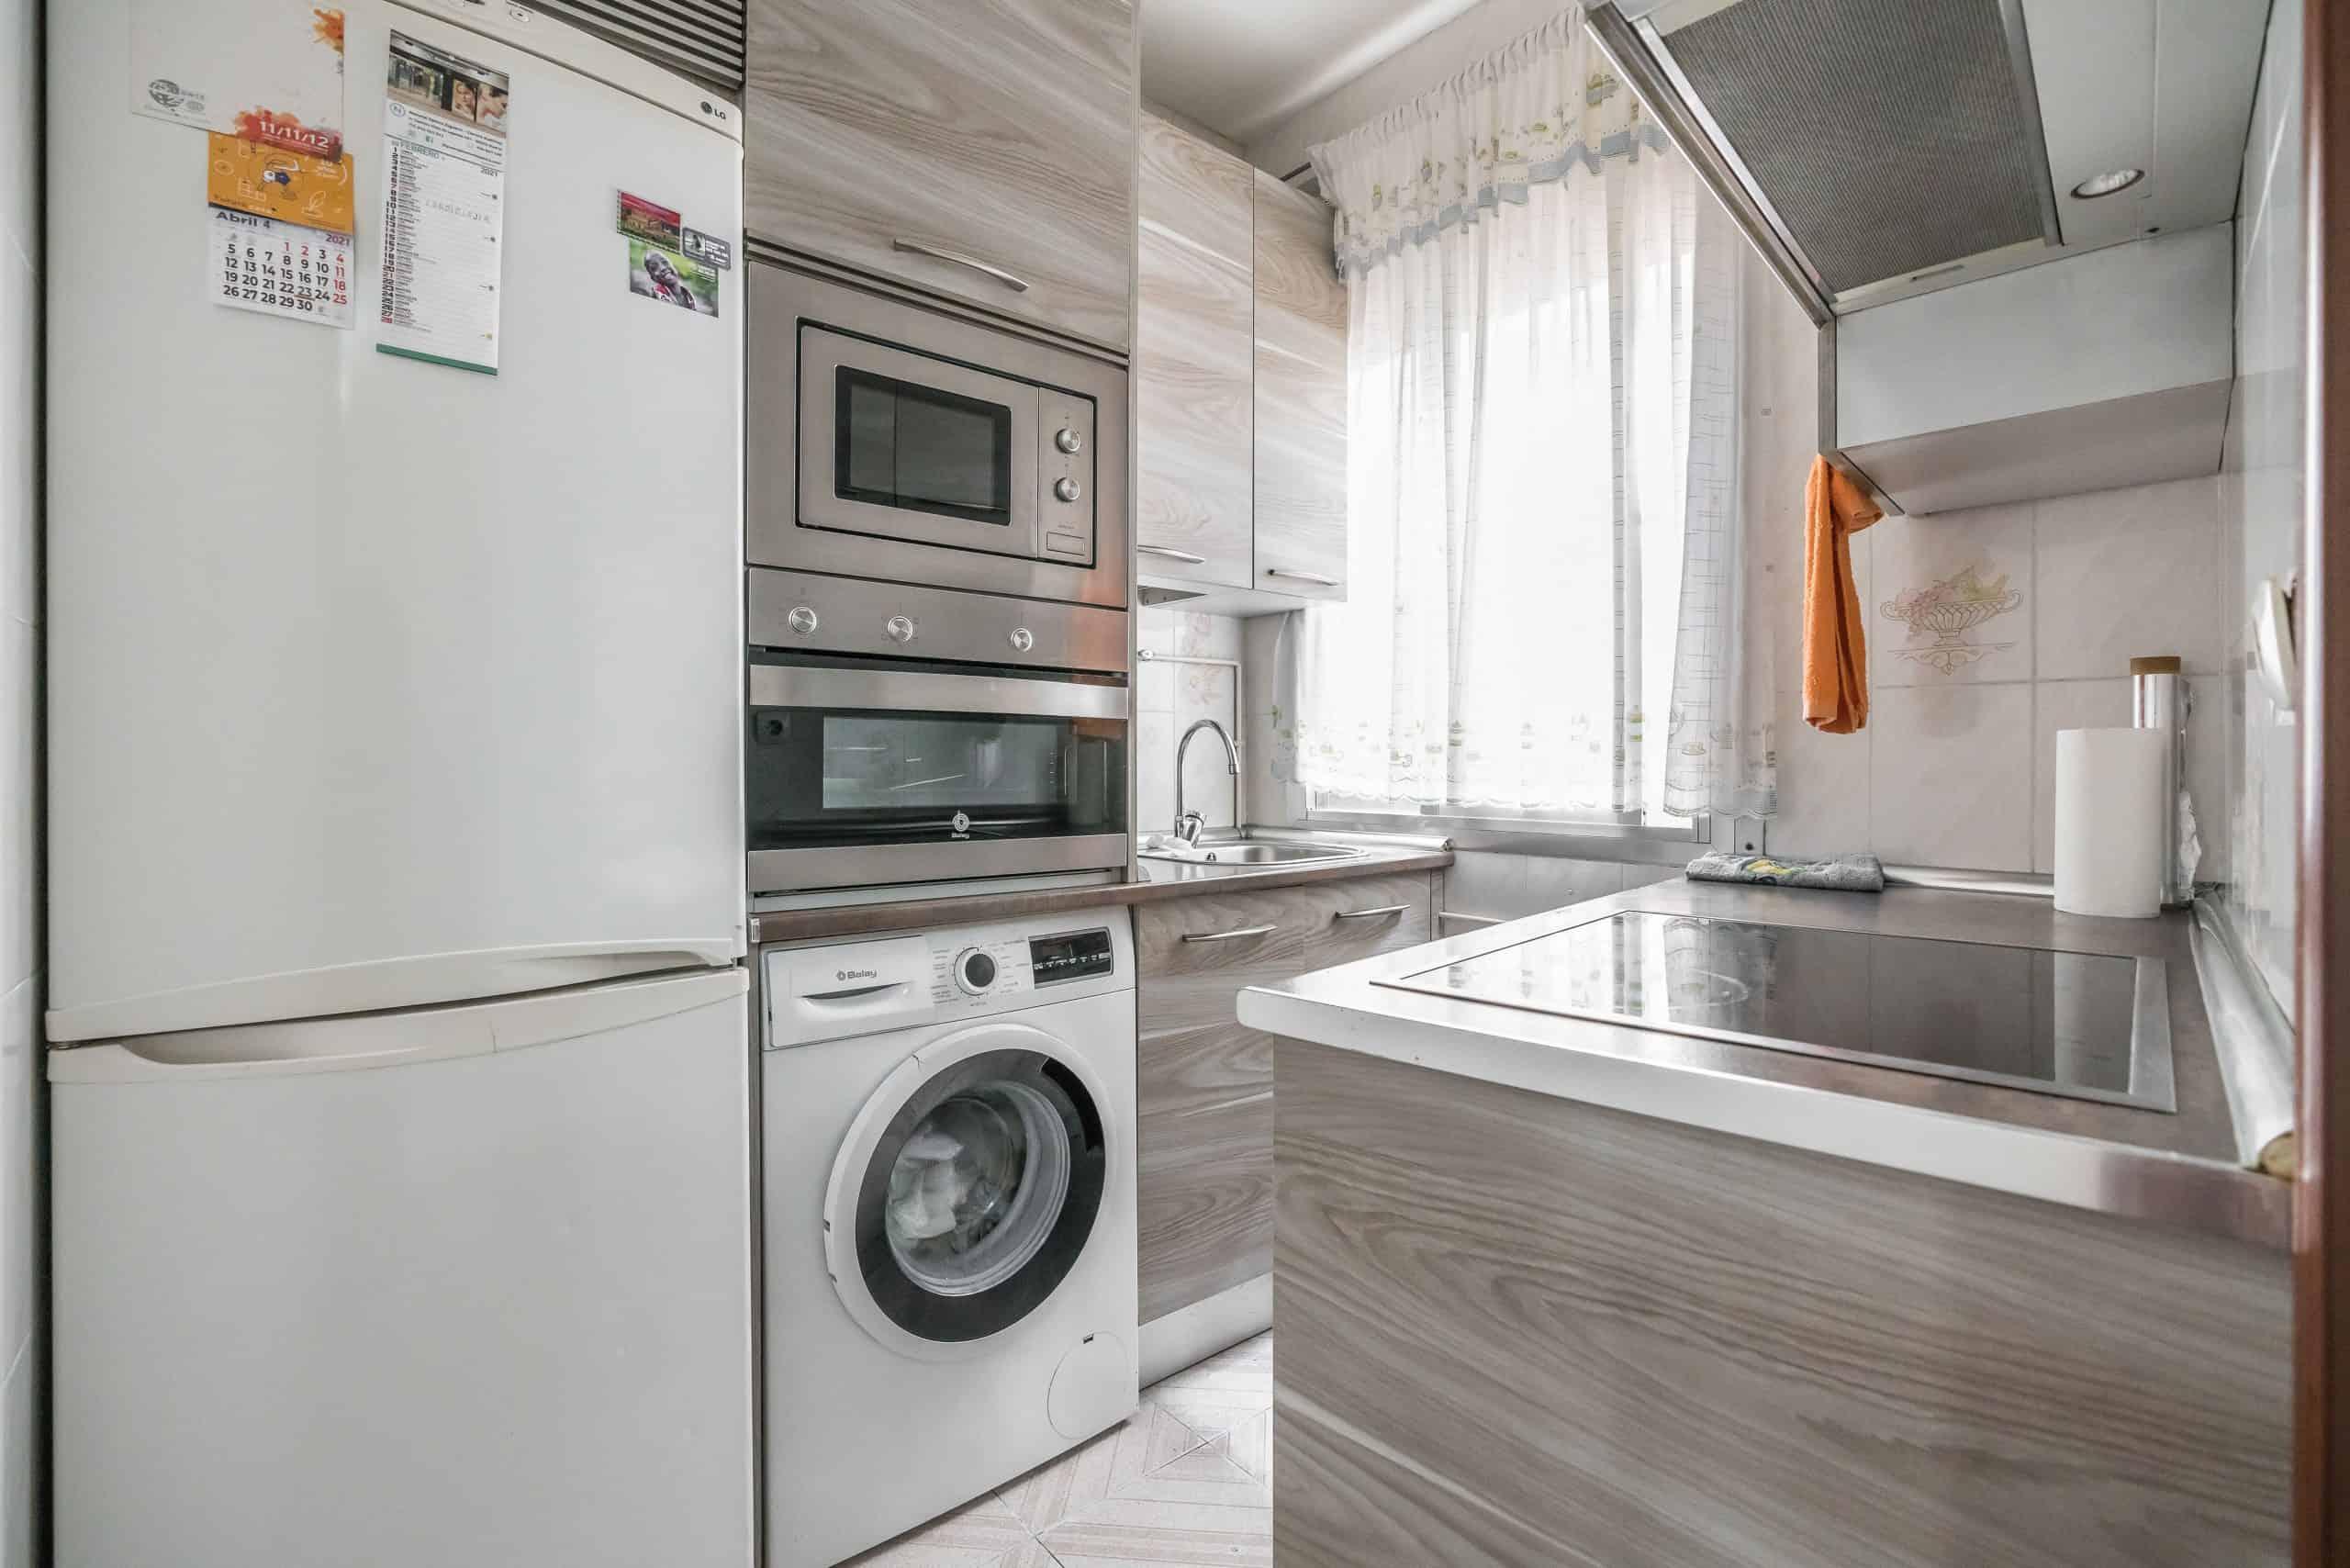 Agencia Inmobiliaria de Madrid-FUTUROCASA-Zona ARGANZUELA-EMBAJADORES-LEGAZPI5 COCINA (2)